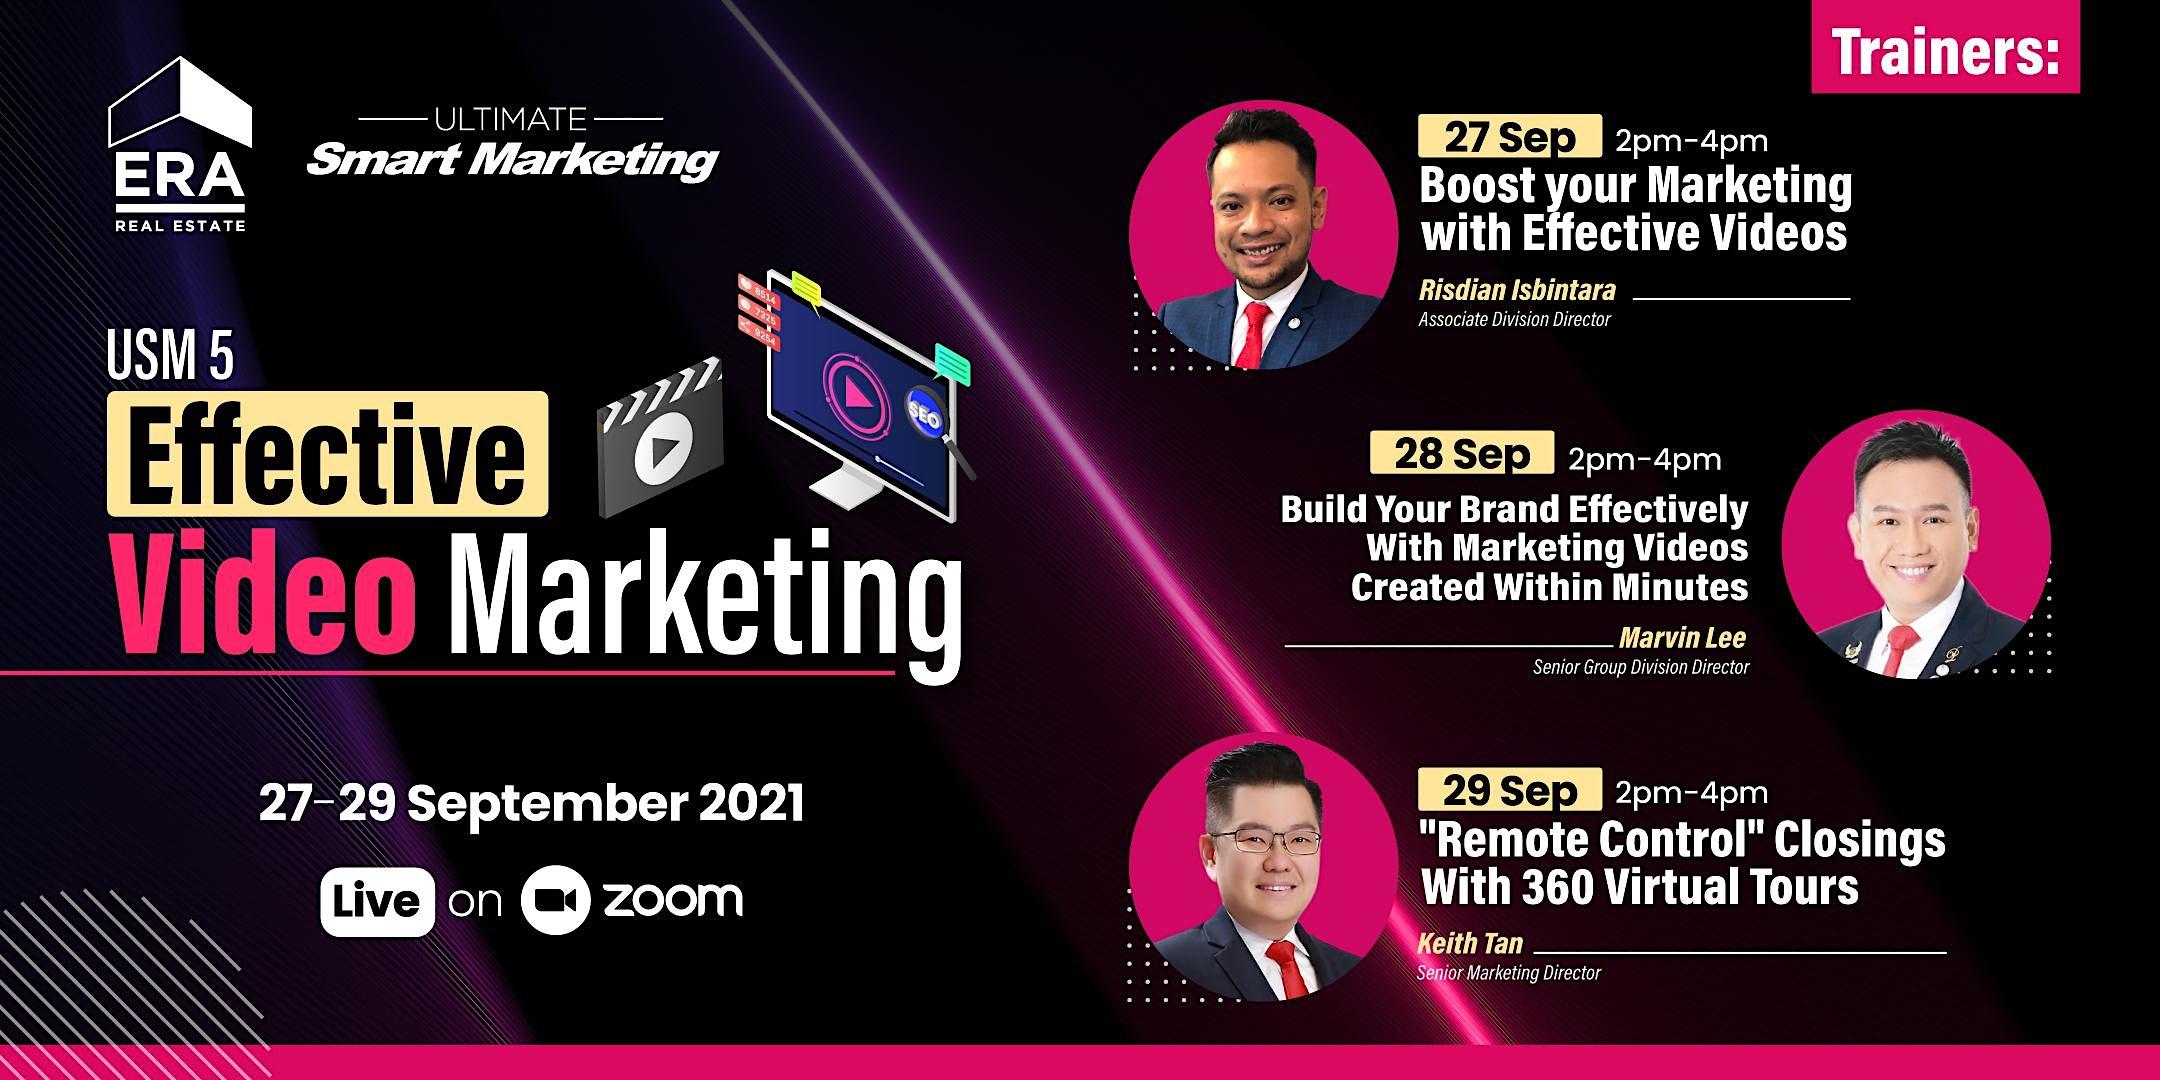 USM 5: Effective Video Marketing